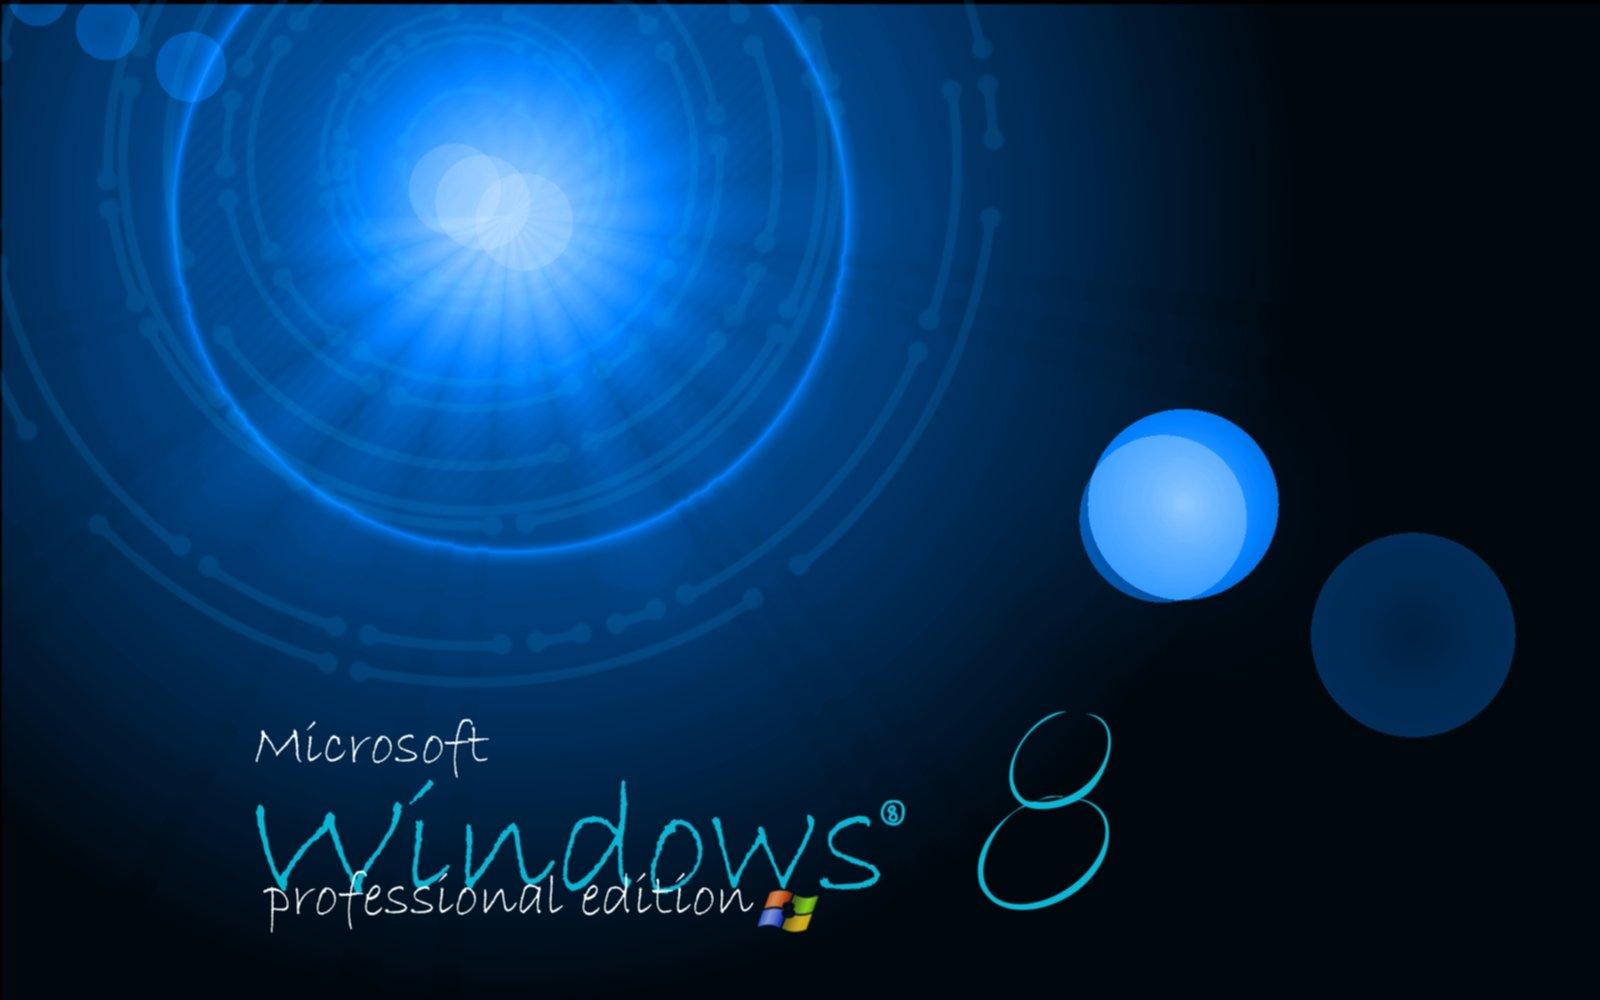 Killzone Shadow Fall Iphone 6 Wallpaper Wallpapers Hd Windows 8 Wallpapers 37 Fondos De